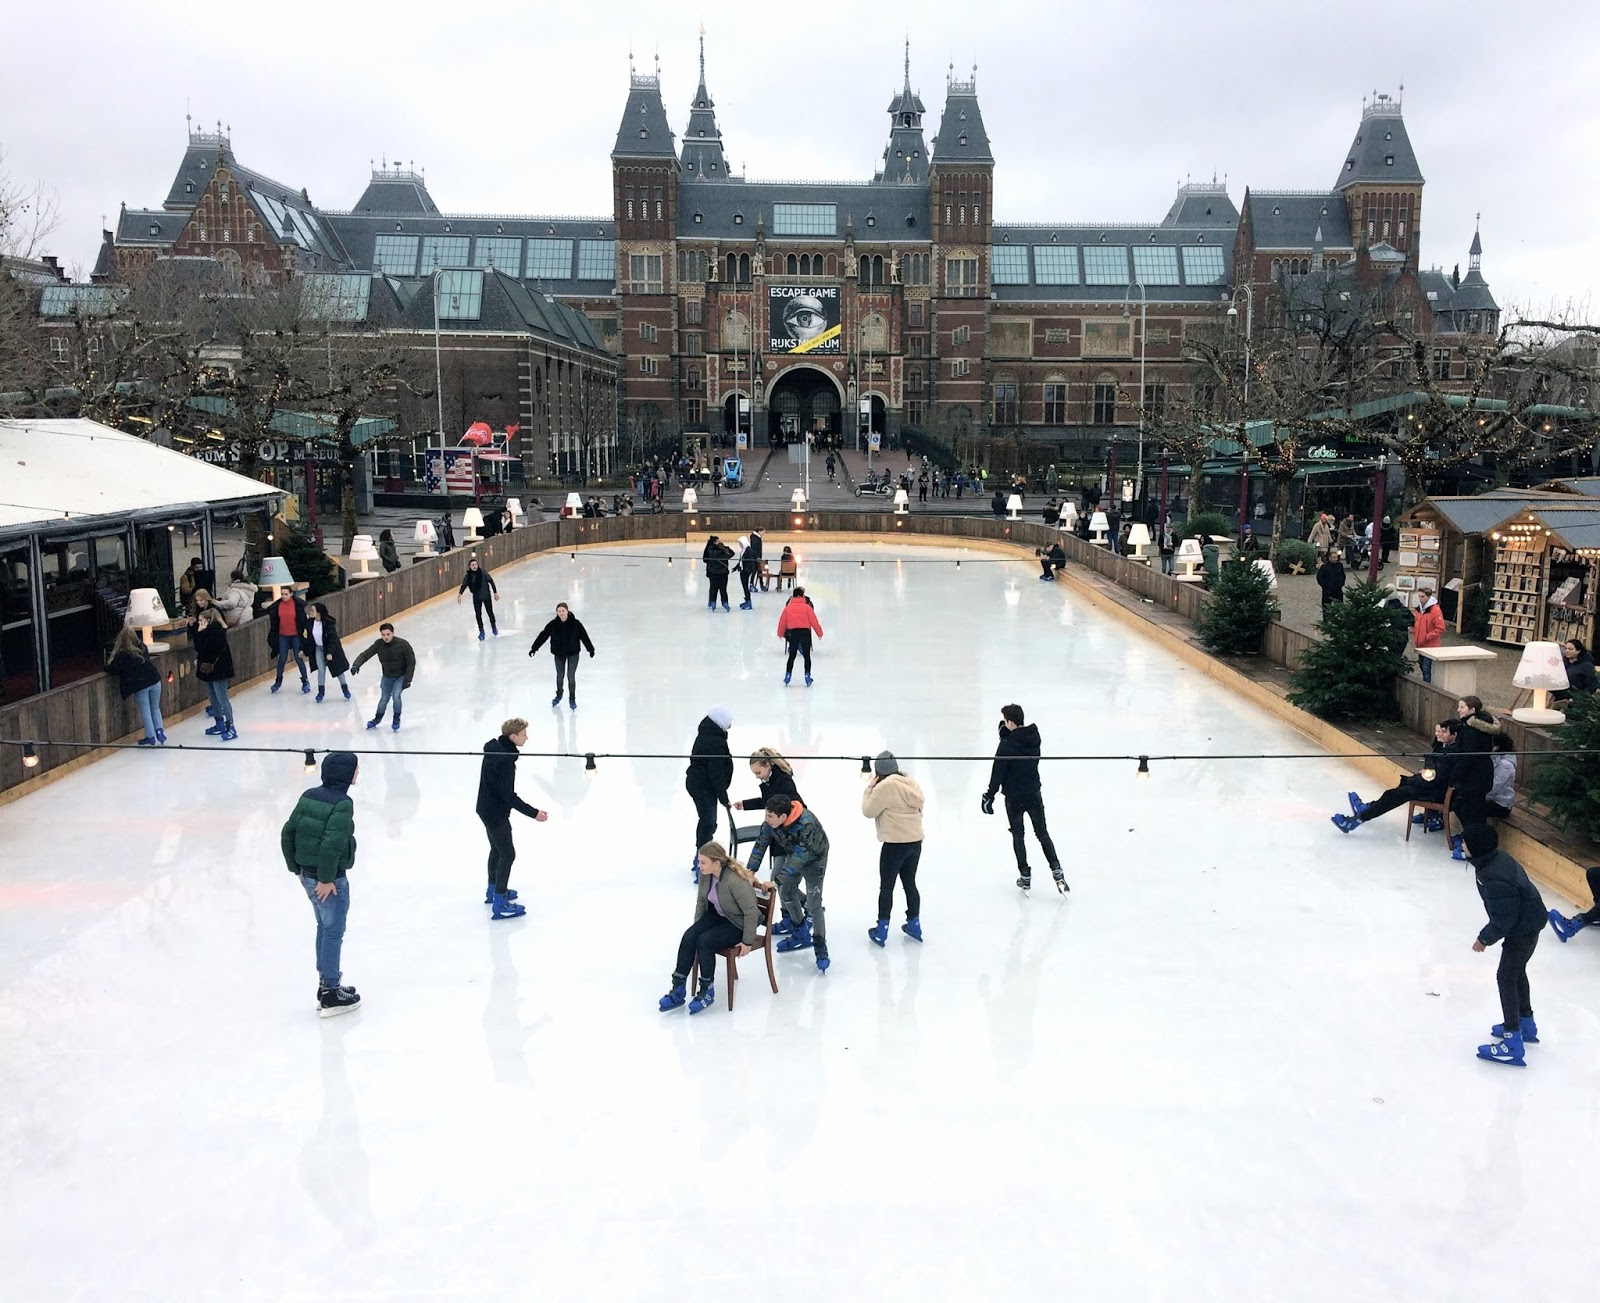 Ice skating in Amsterdam Museumplein